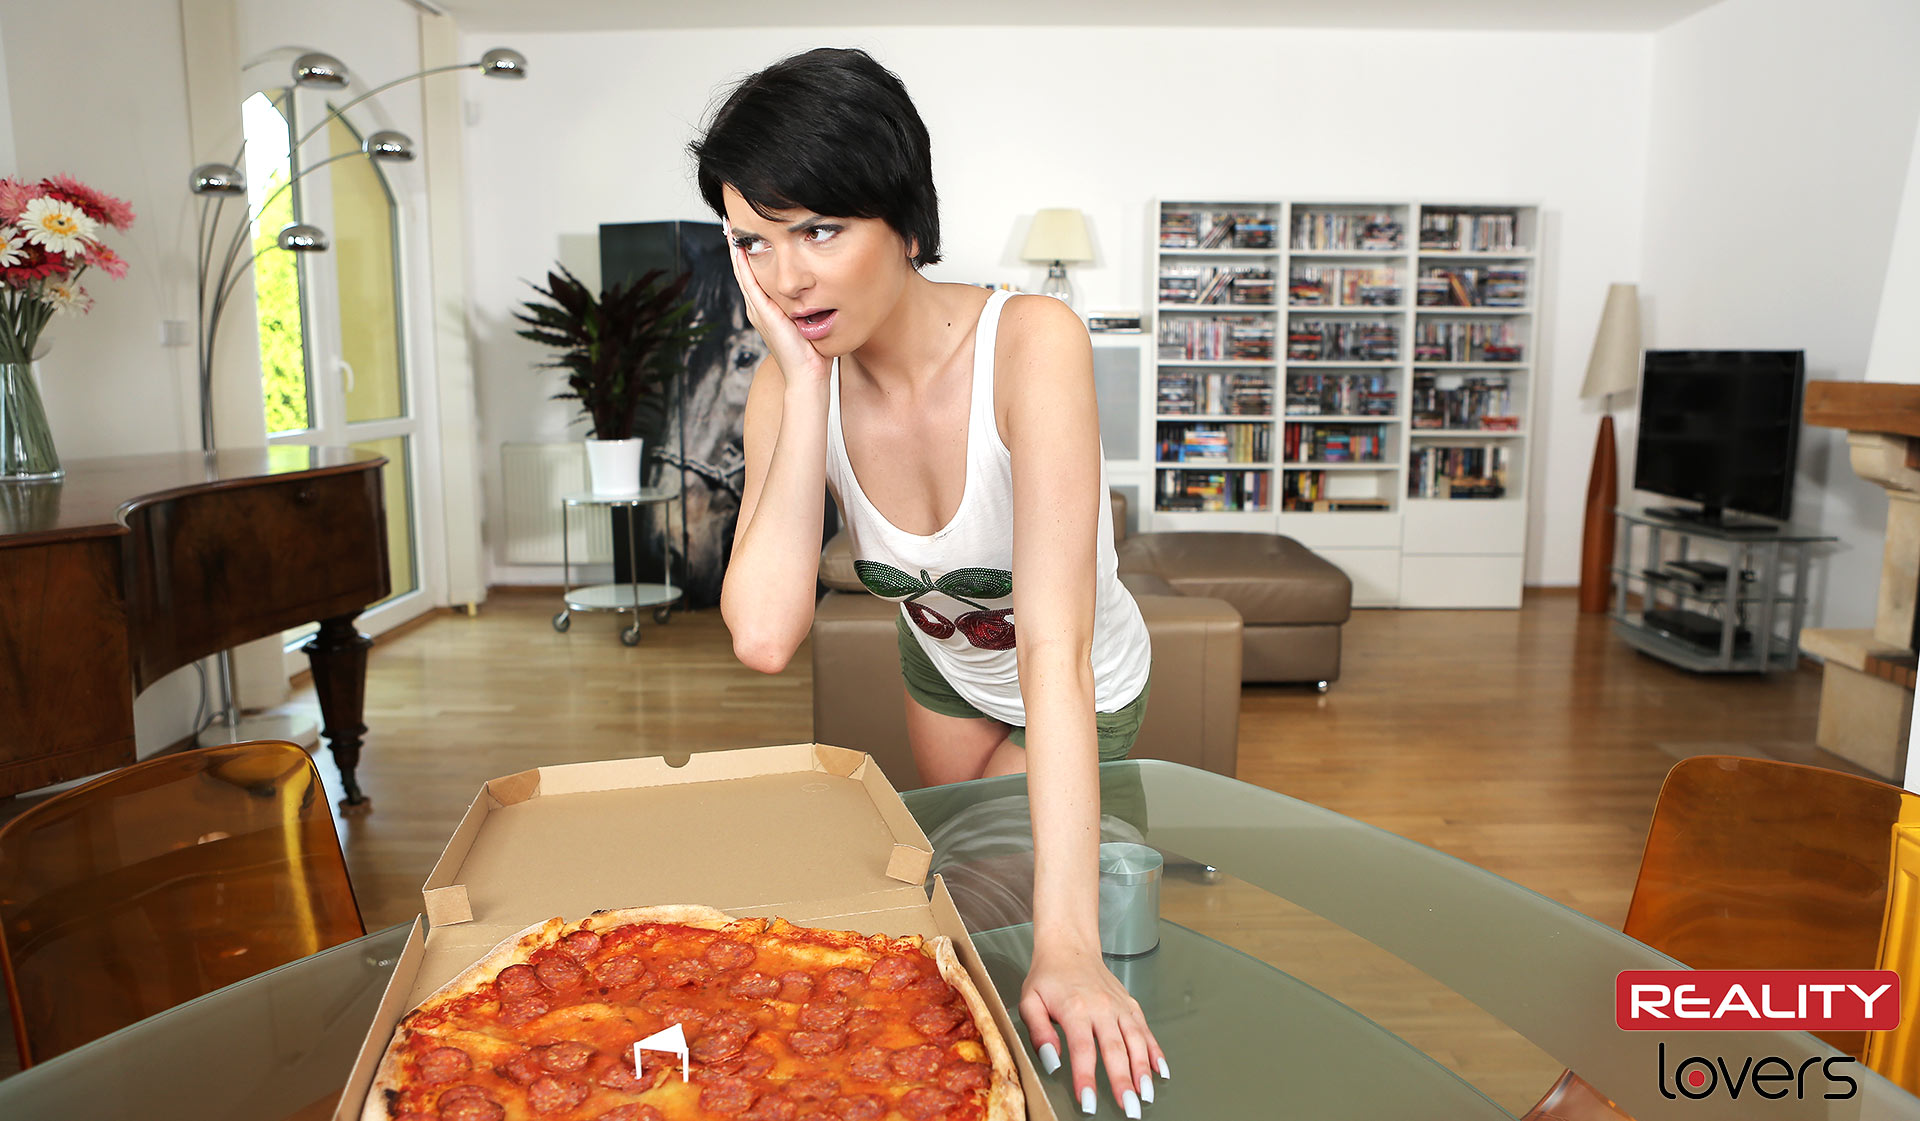 Do The Pizza Girl!